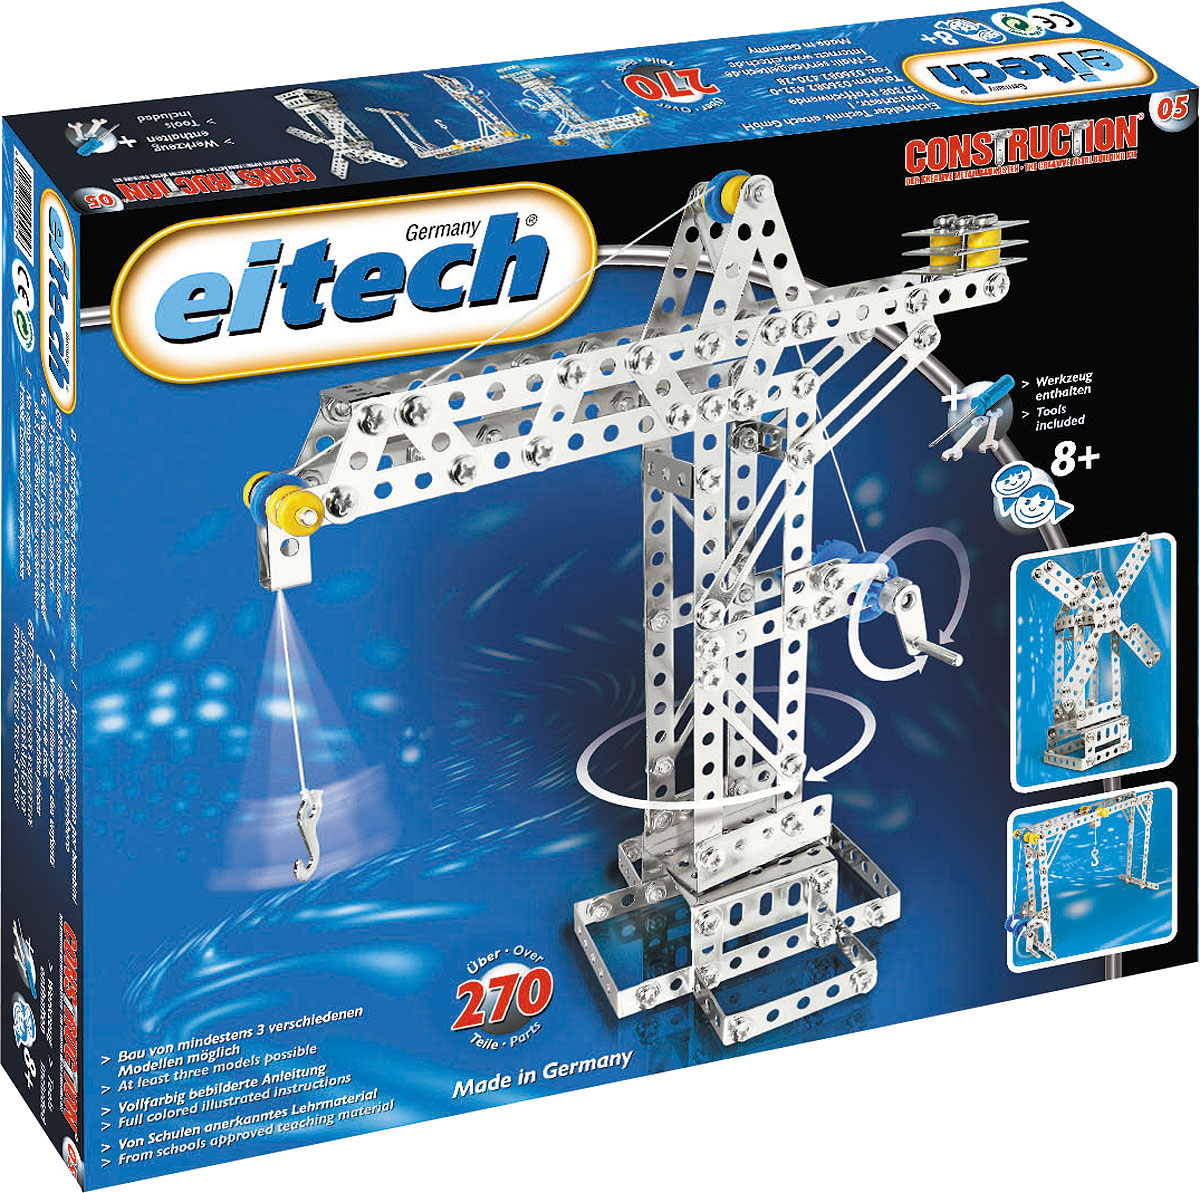 Eitech Конструктор Кран конструкторы eitech конструктор меxаник 250 деталей